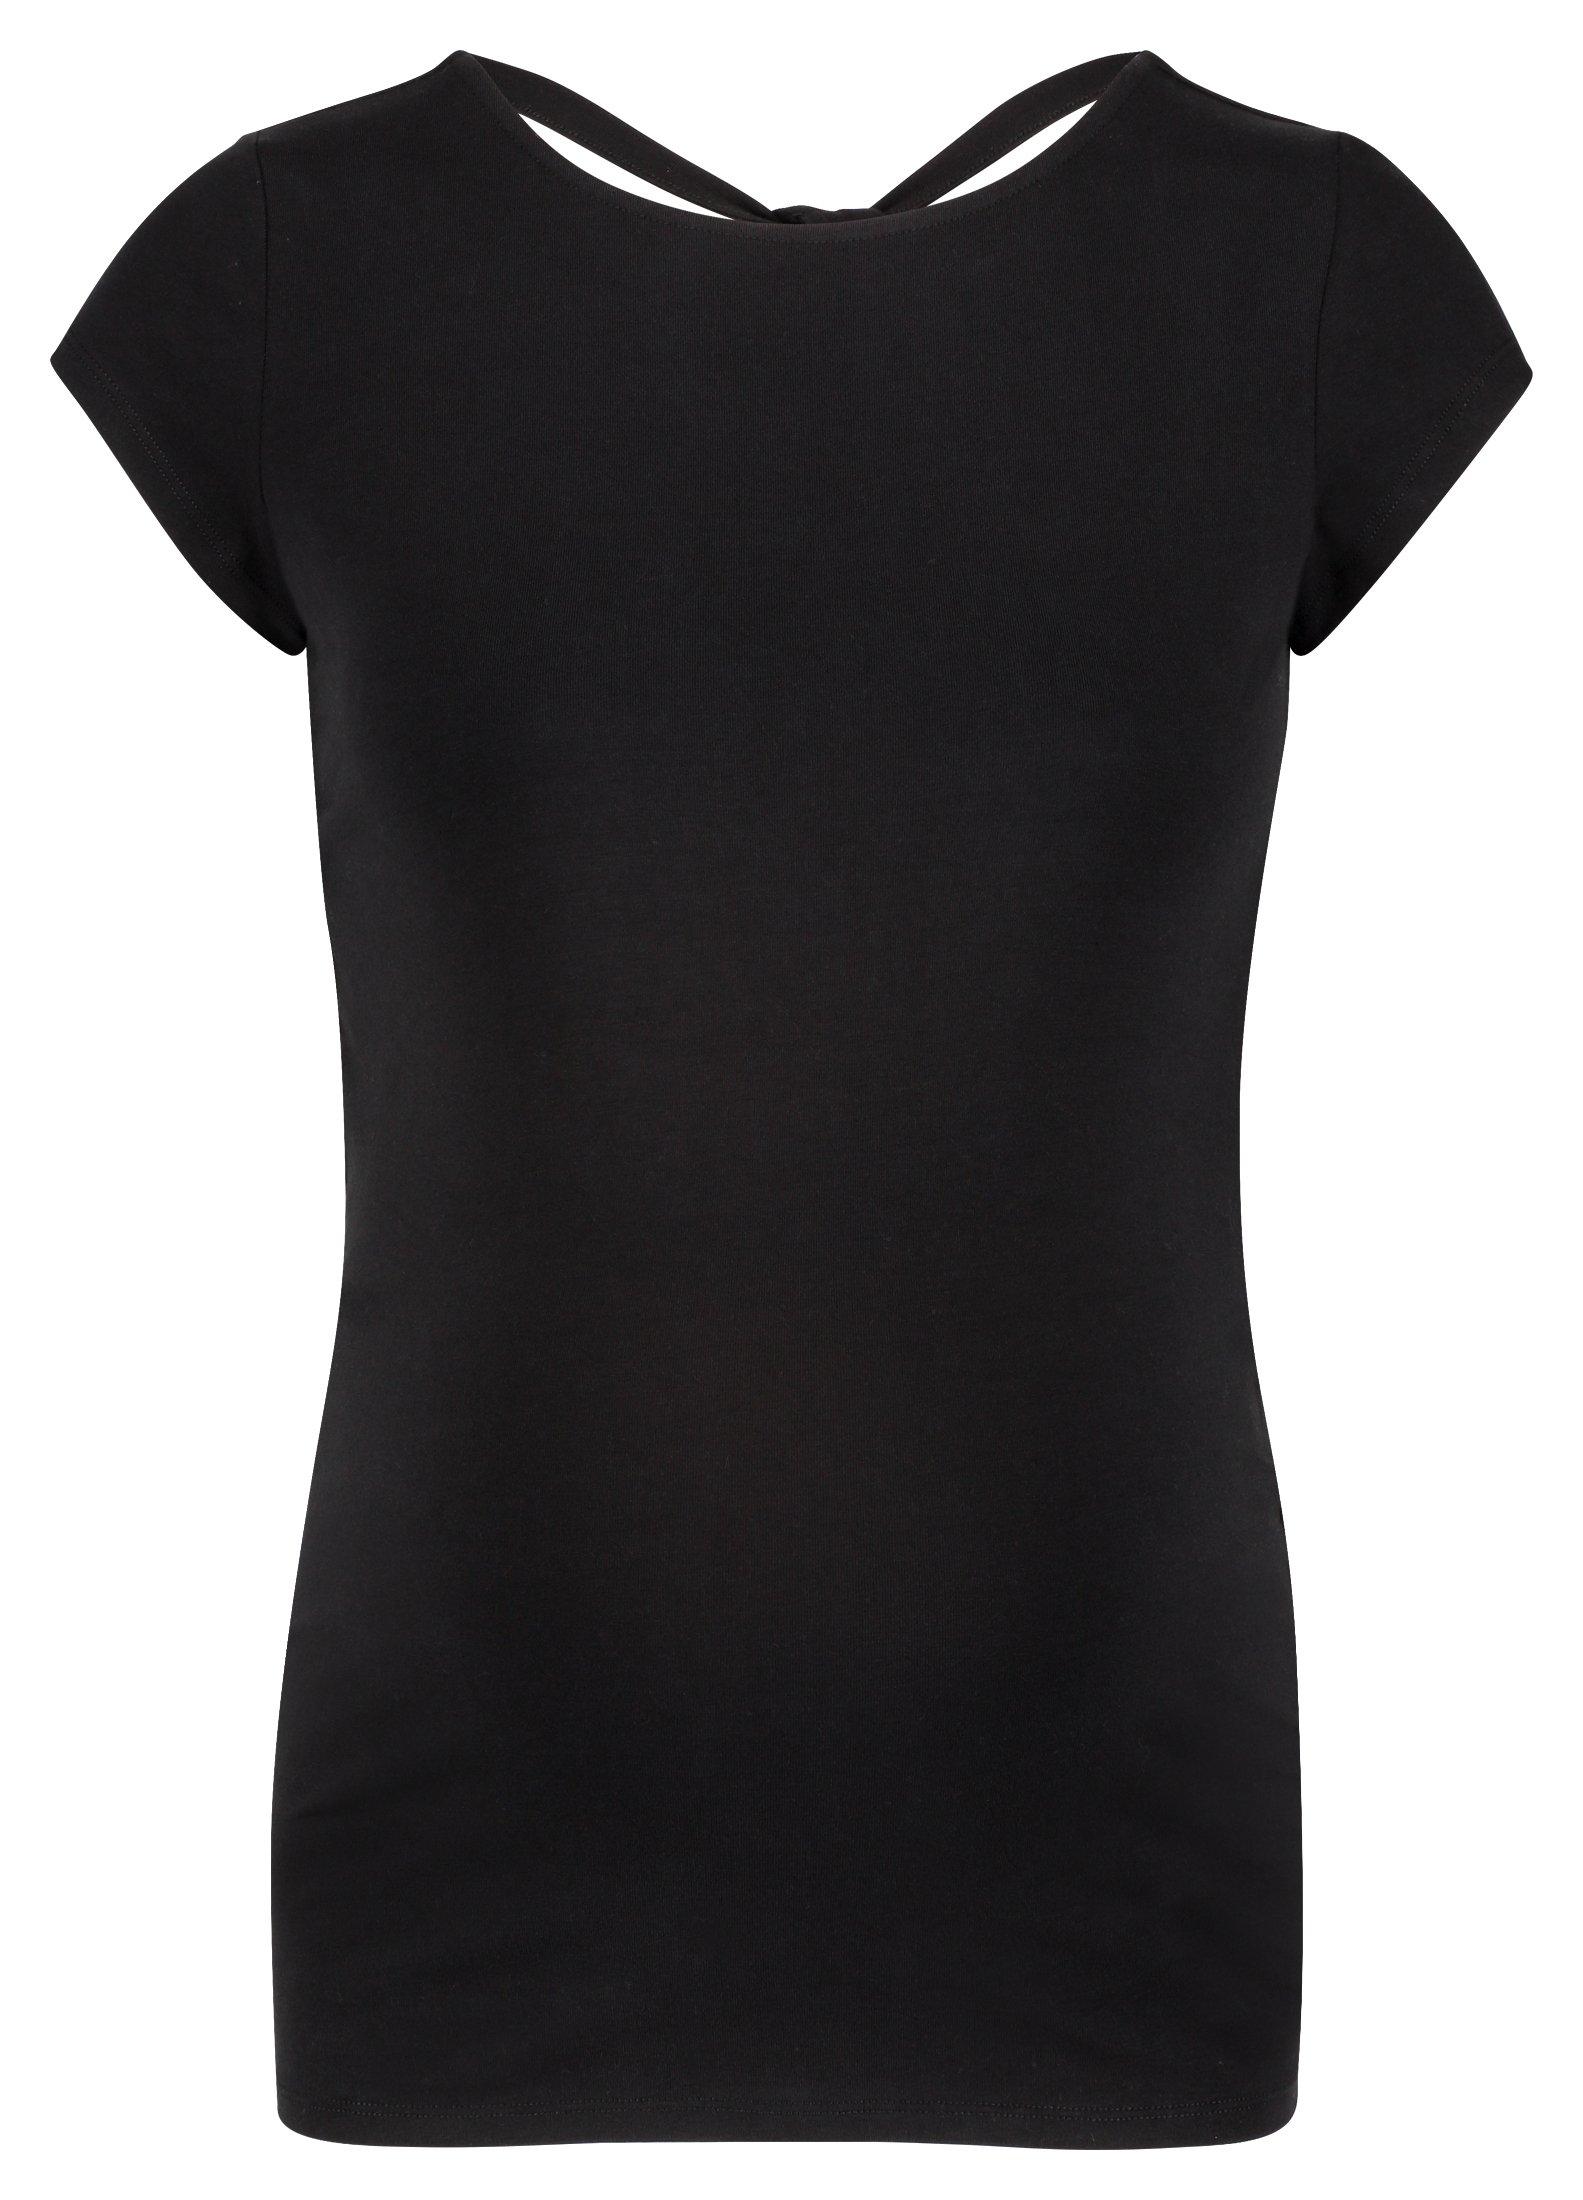 Noppies t-shirt »Boaz« - gratis ruilen op otto.nl